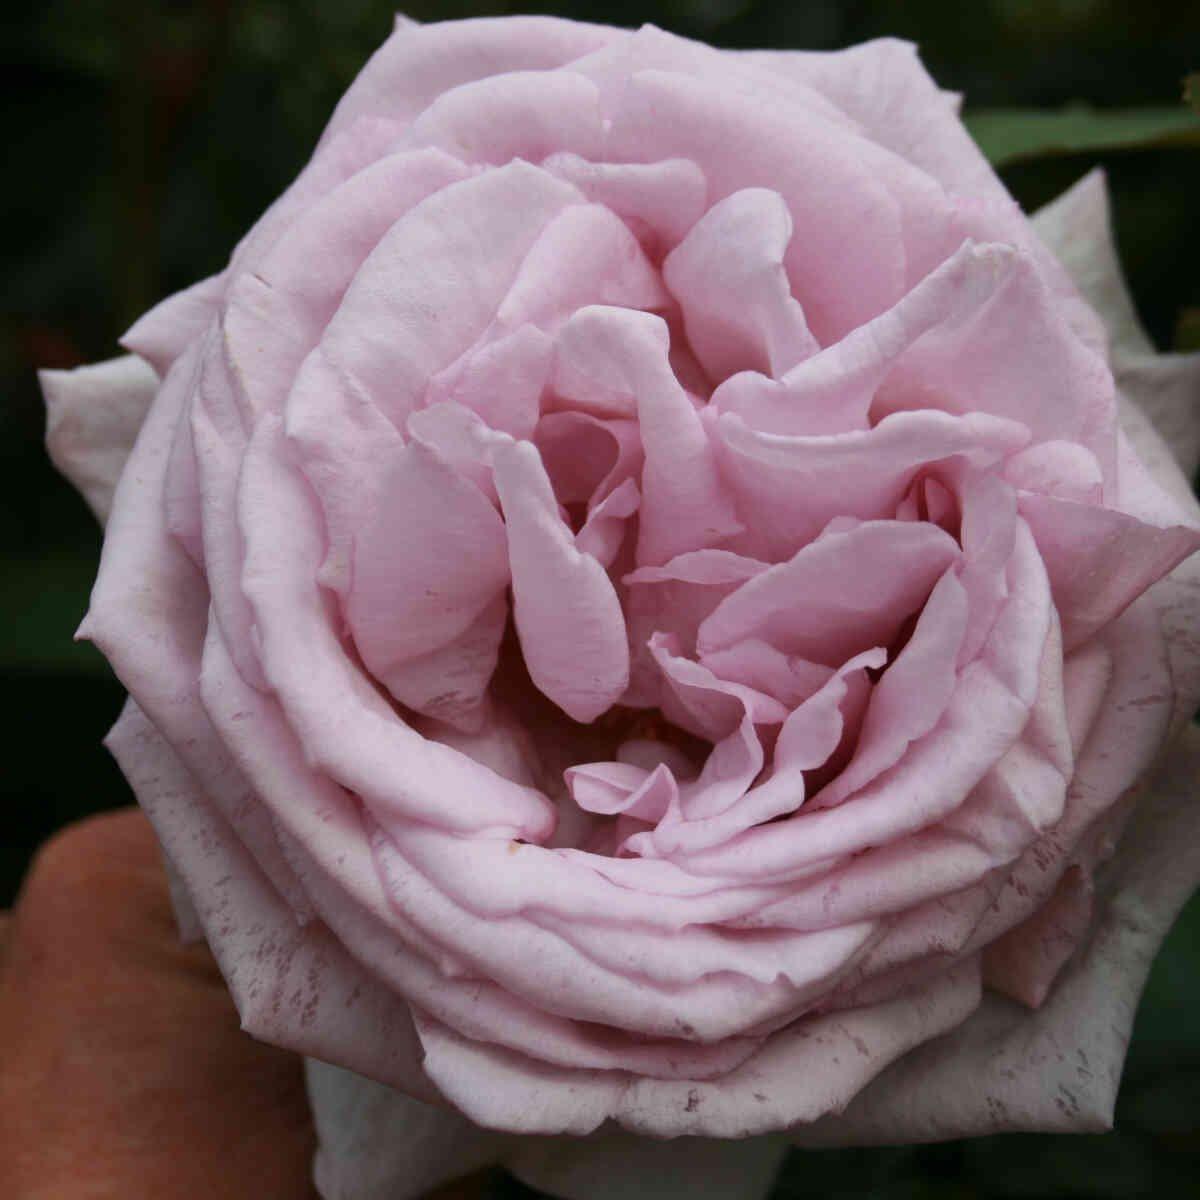 Rose 'Bering Renaissance'